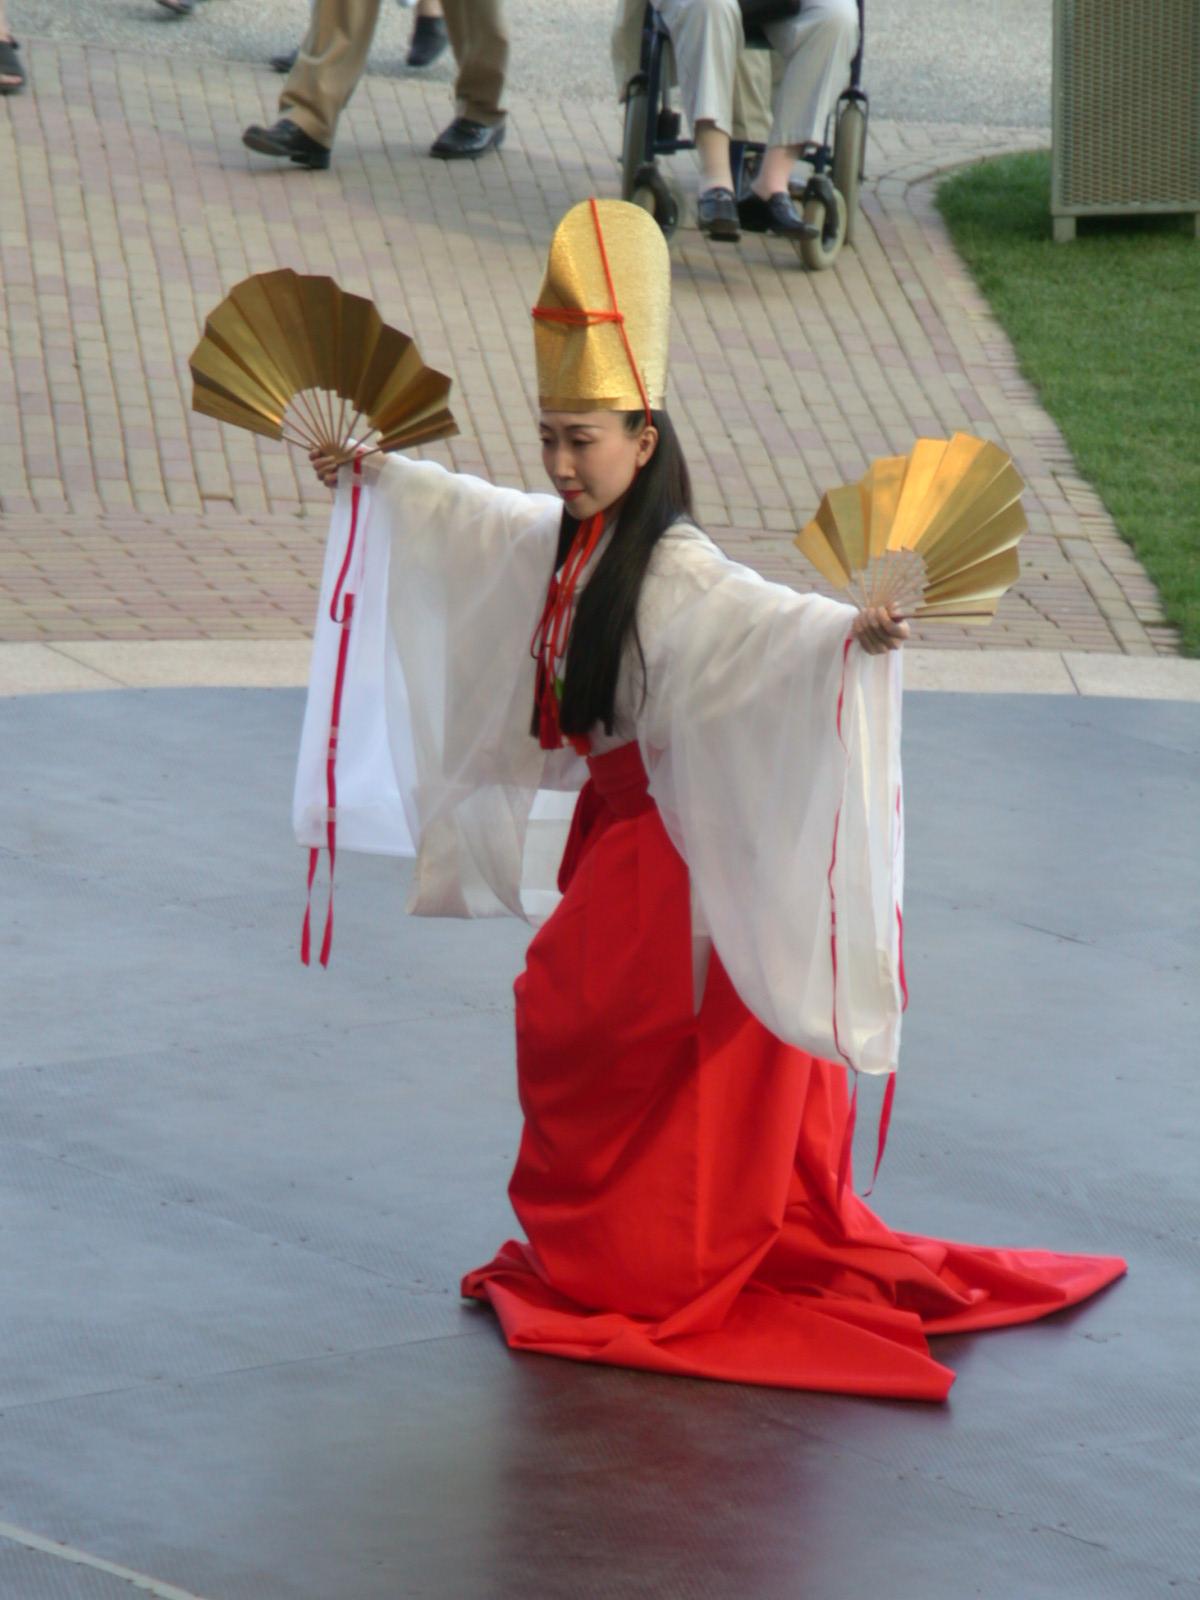 japanes dancer human woman humanoid dress hat gold golden performance textures